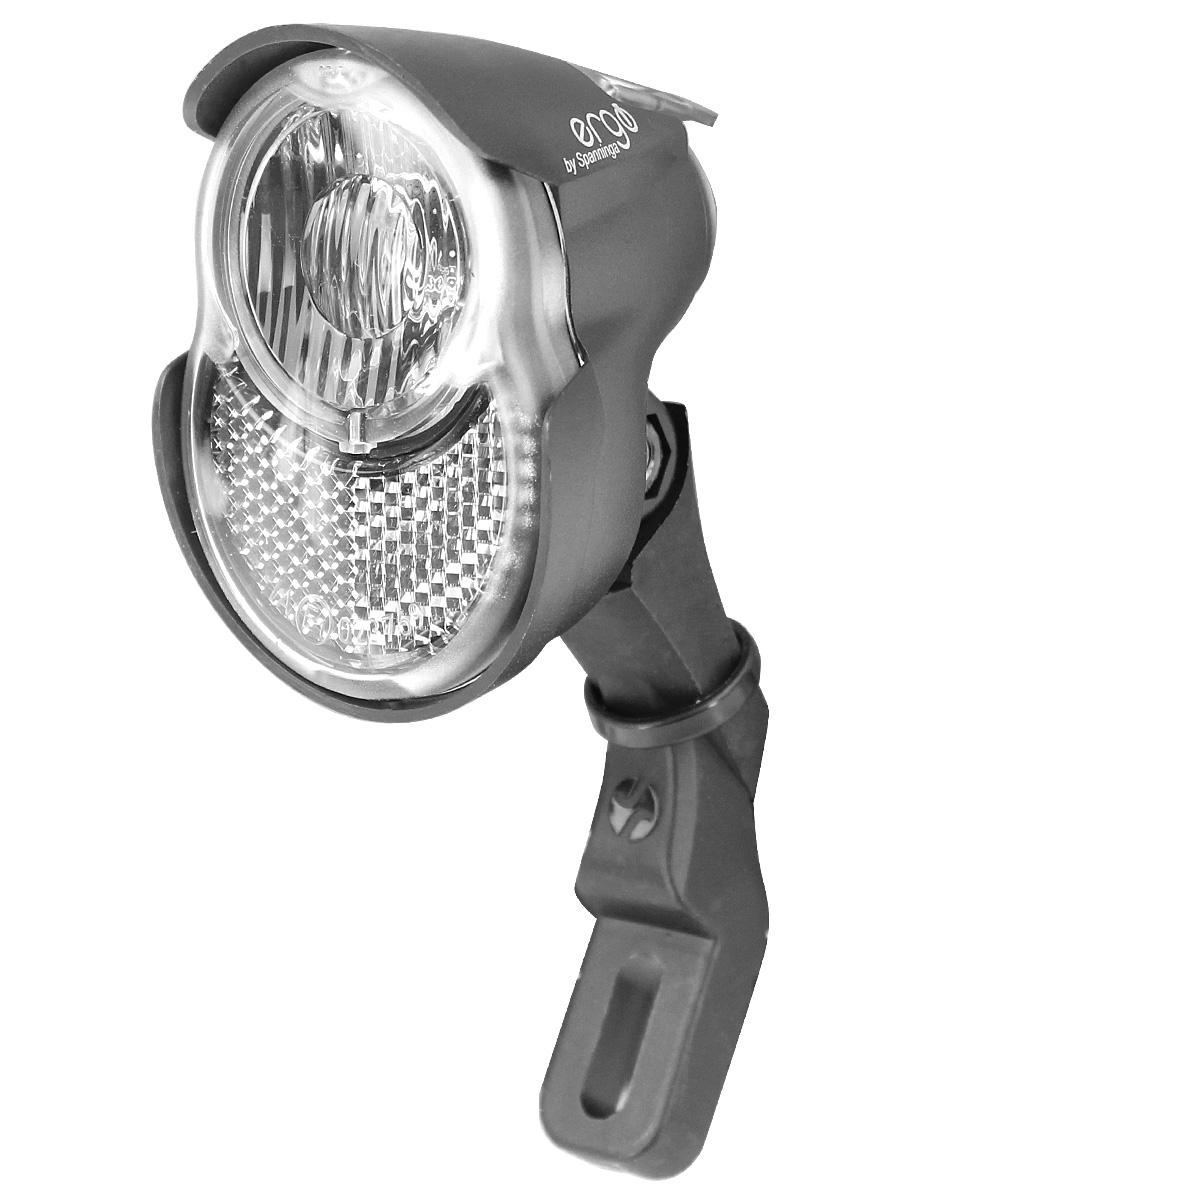 Éclairage avant Spanninga Ergo Xda 1 LED / 20 Lux (Dynamo et moyeu dynamo)